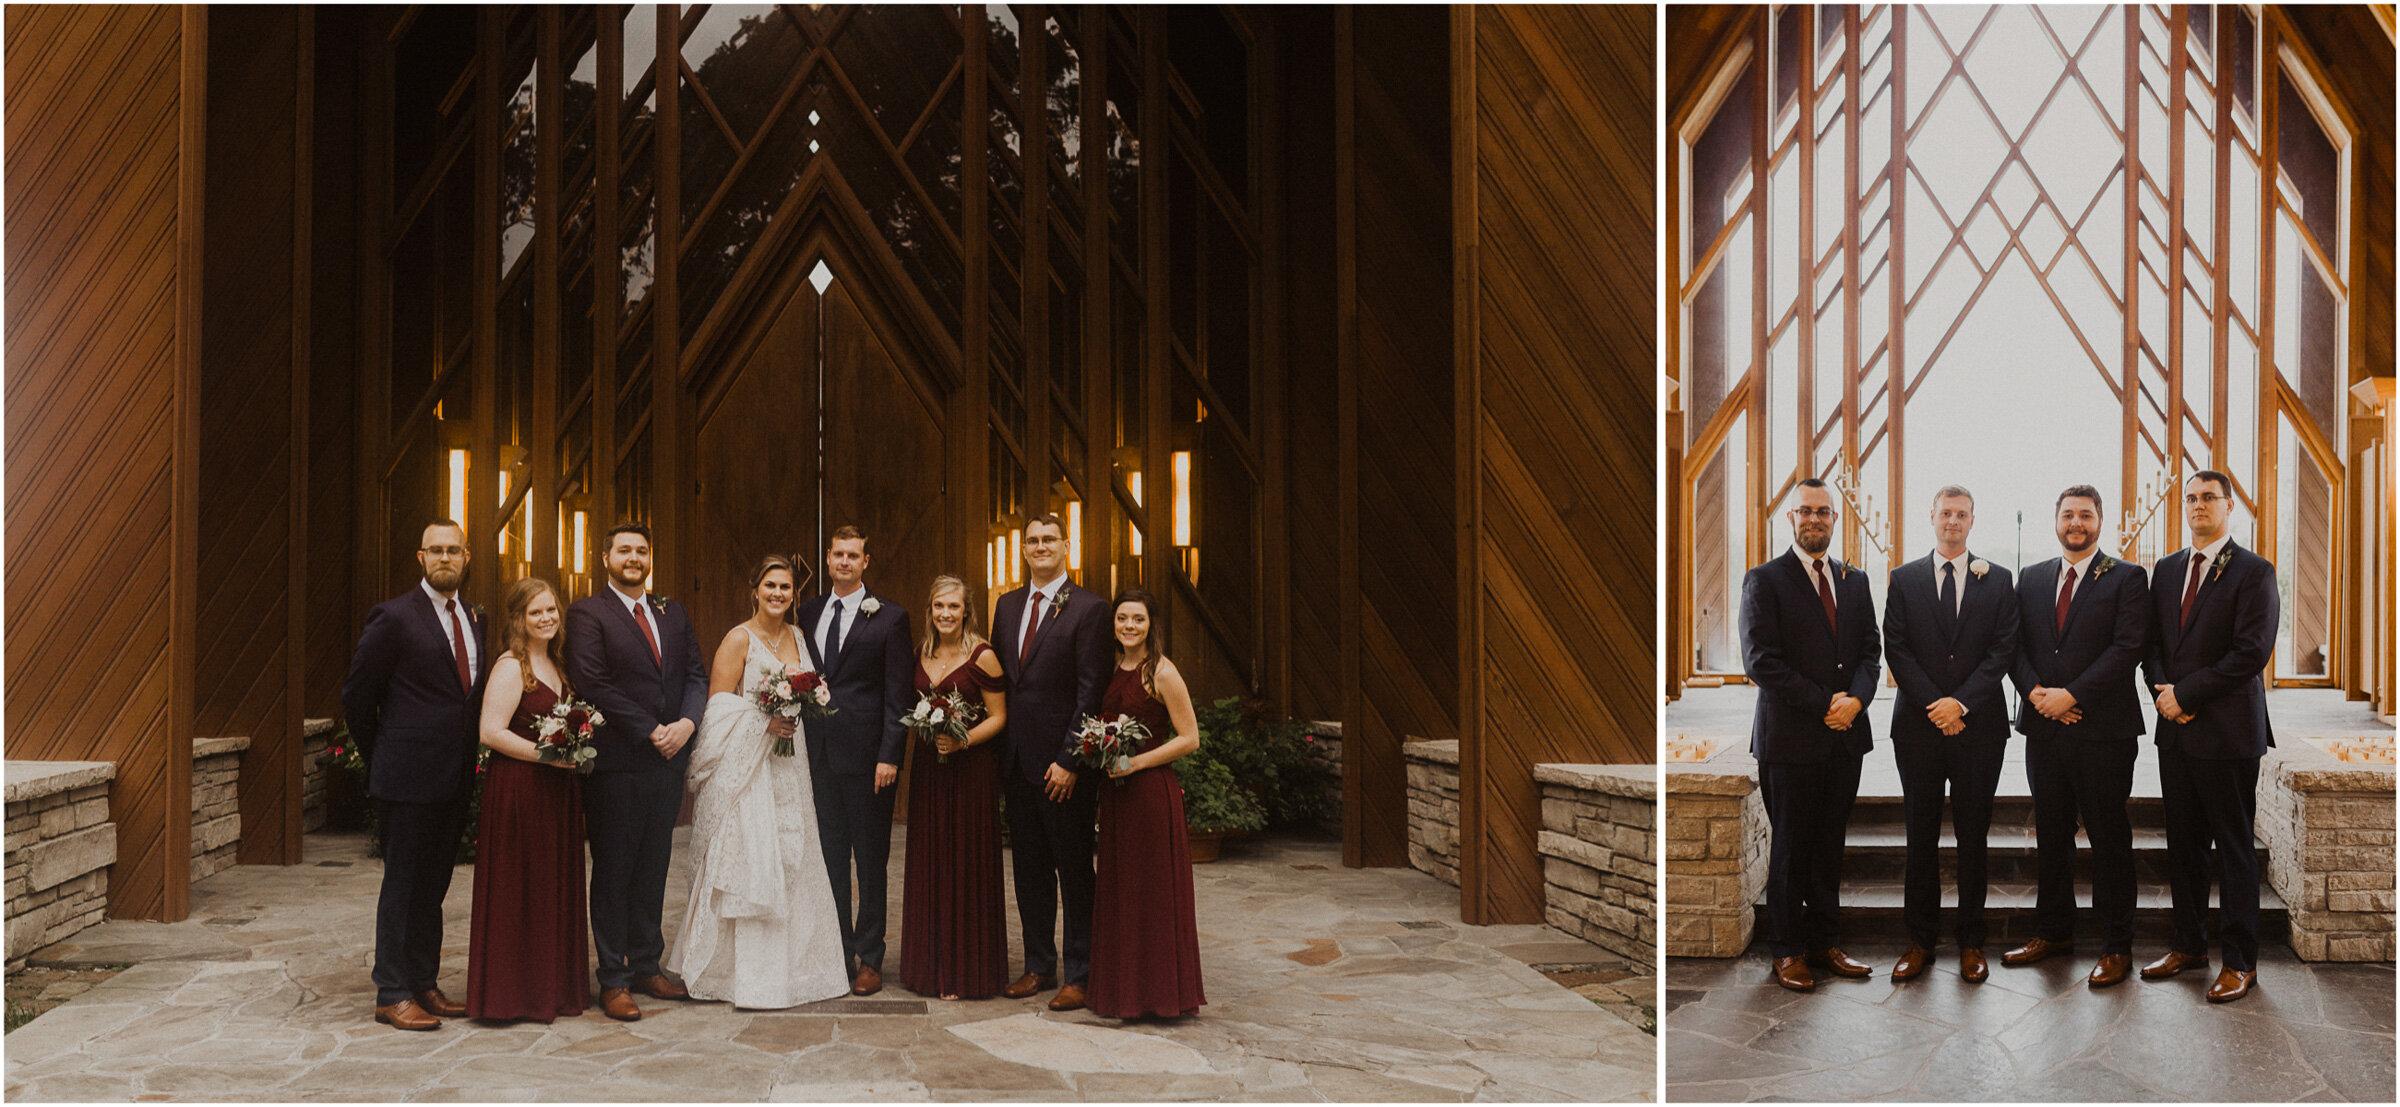 alyssa barletter photography summer wedding photographer powell gardens-20.jpg